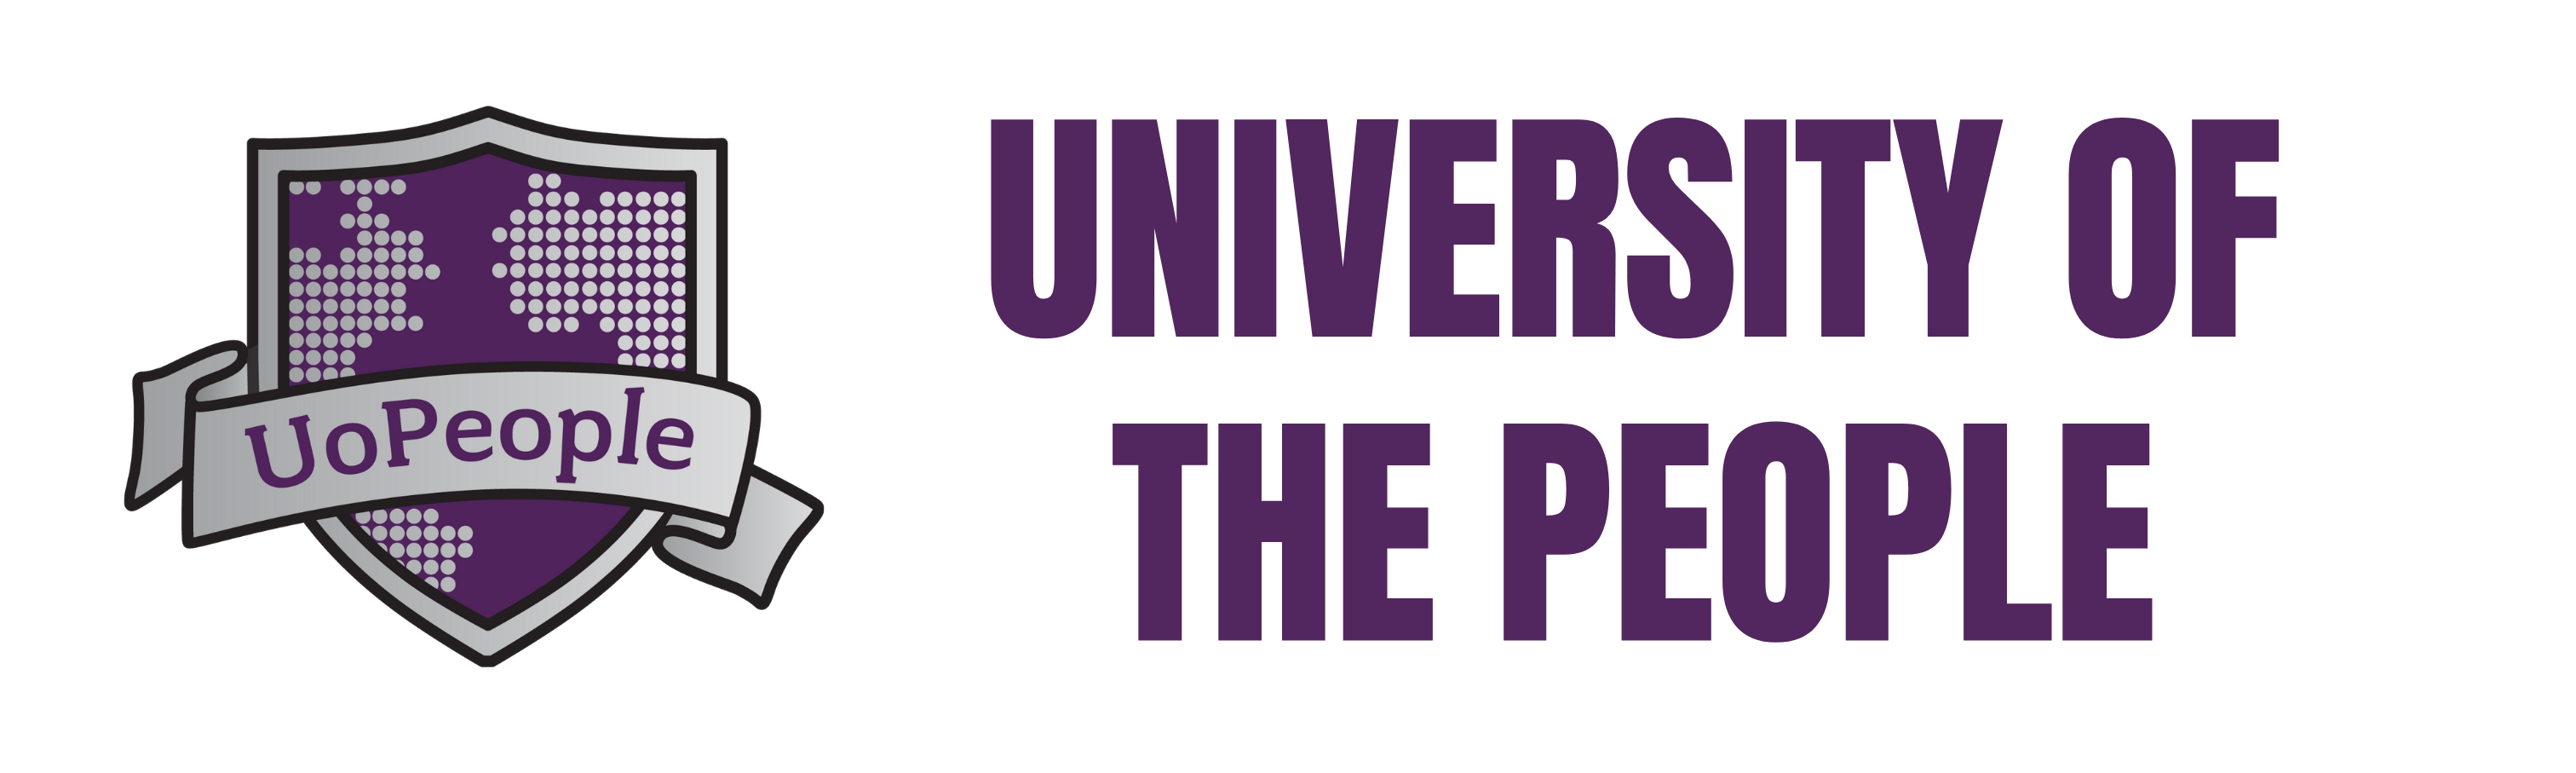 University of the people logo